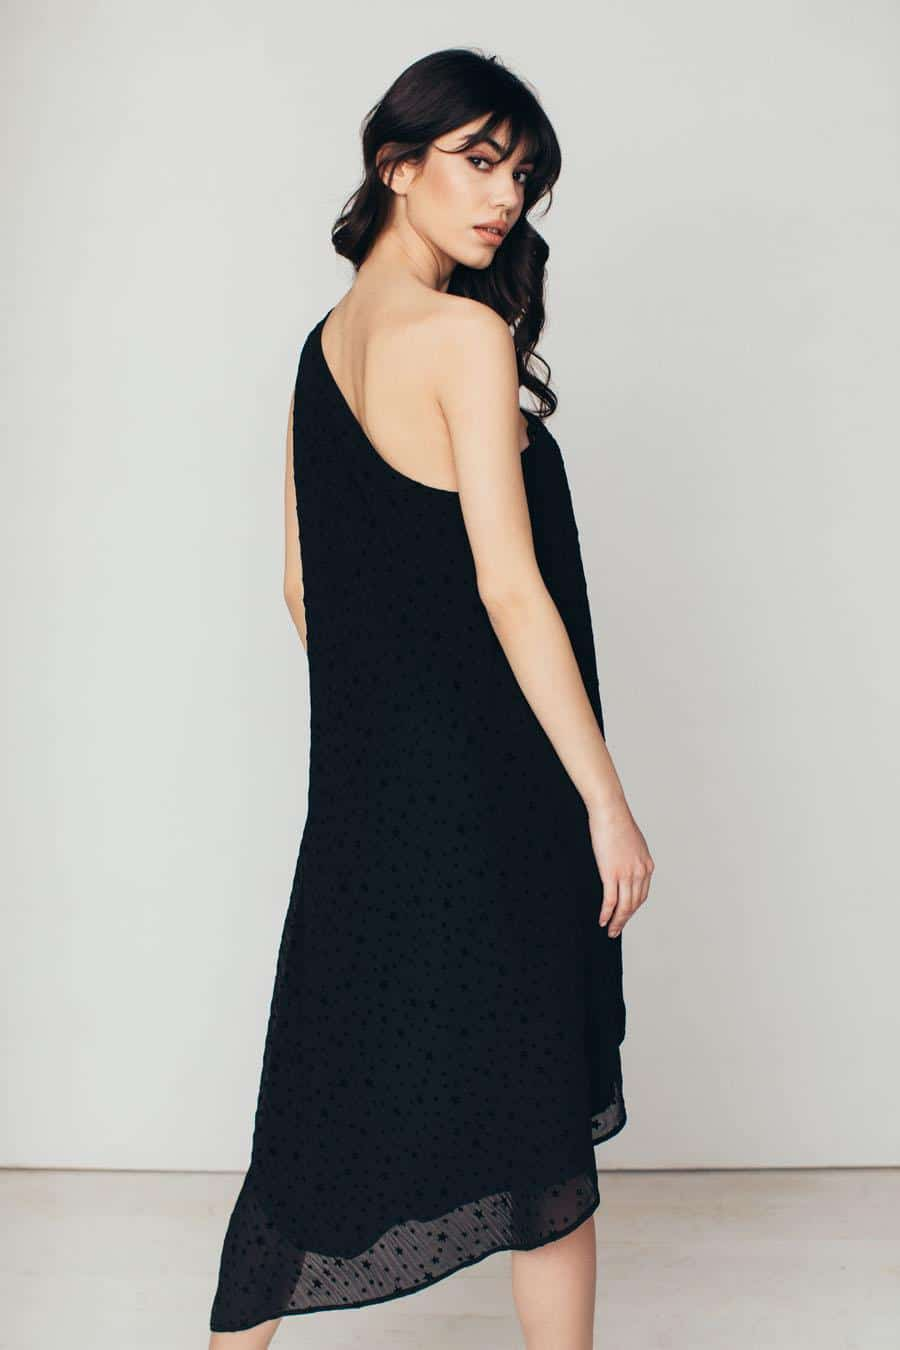 jagger zenska haljina kolekcija prolece leto 2021 ss 2021 kupi online jg 5506 01